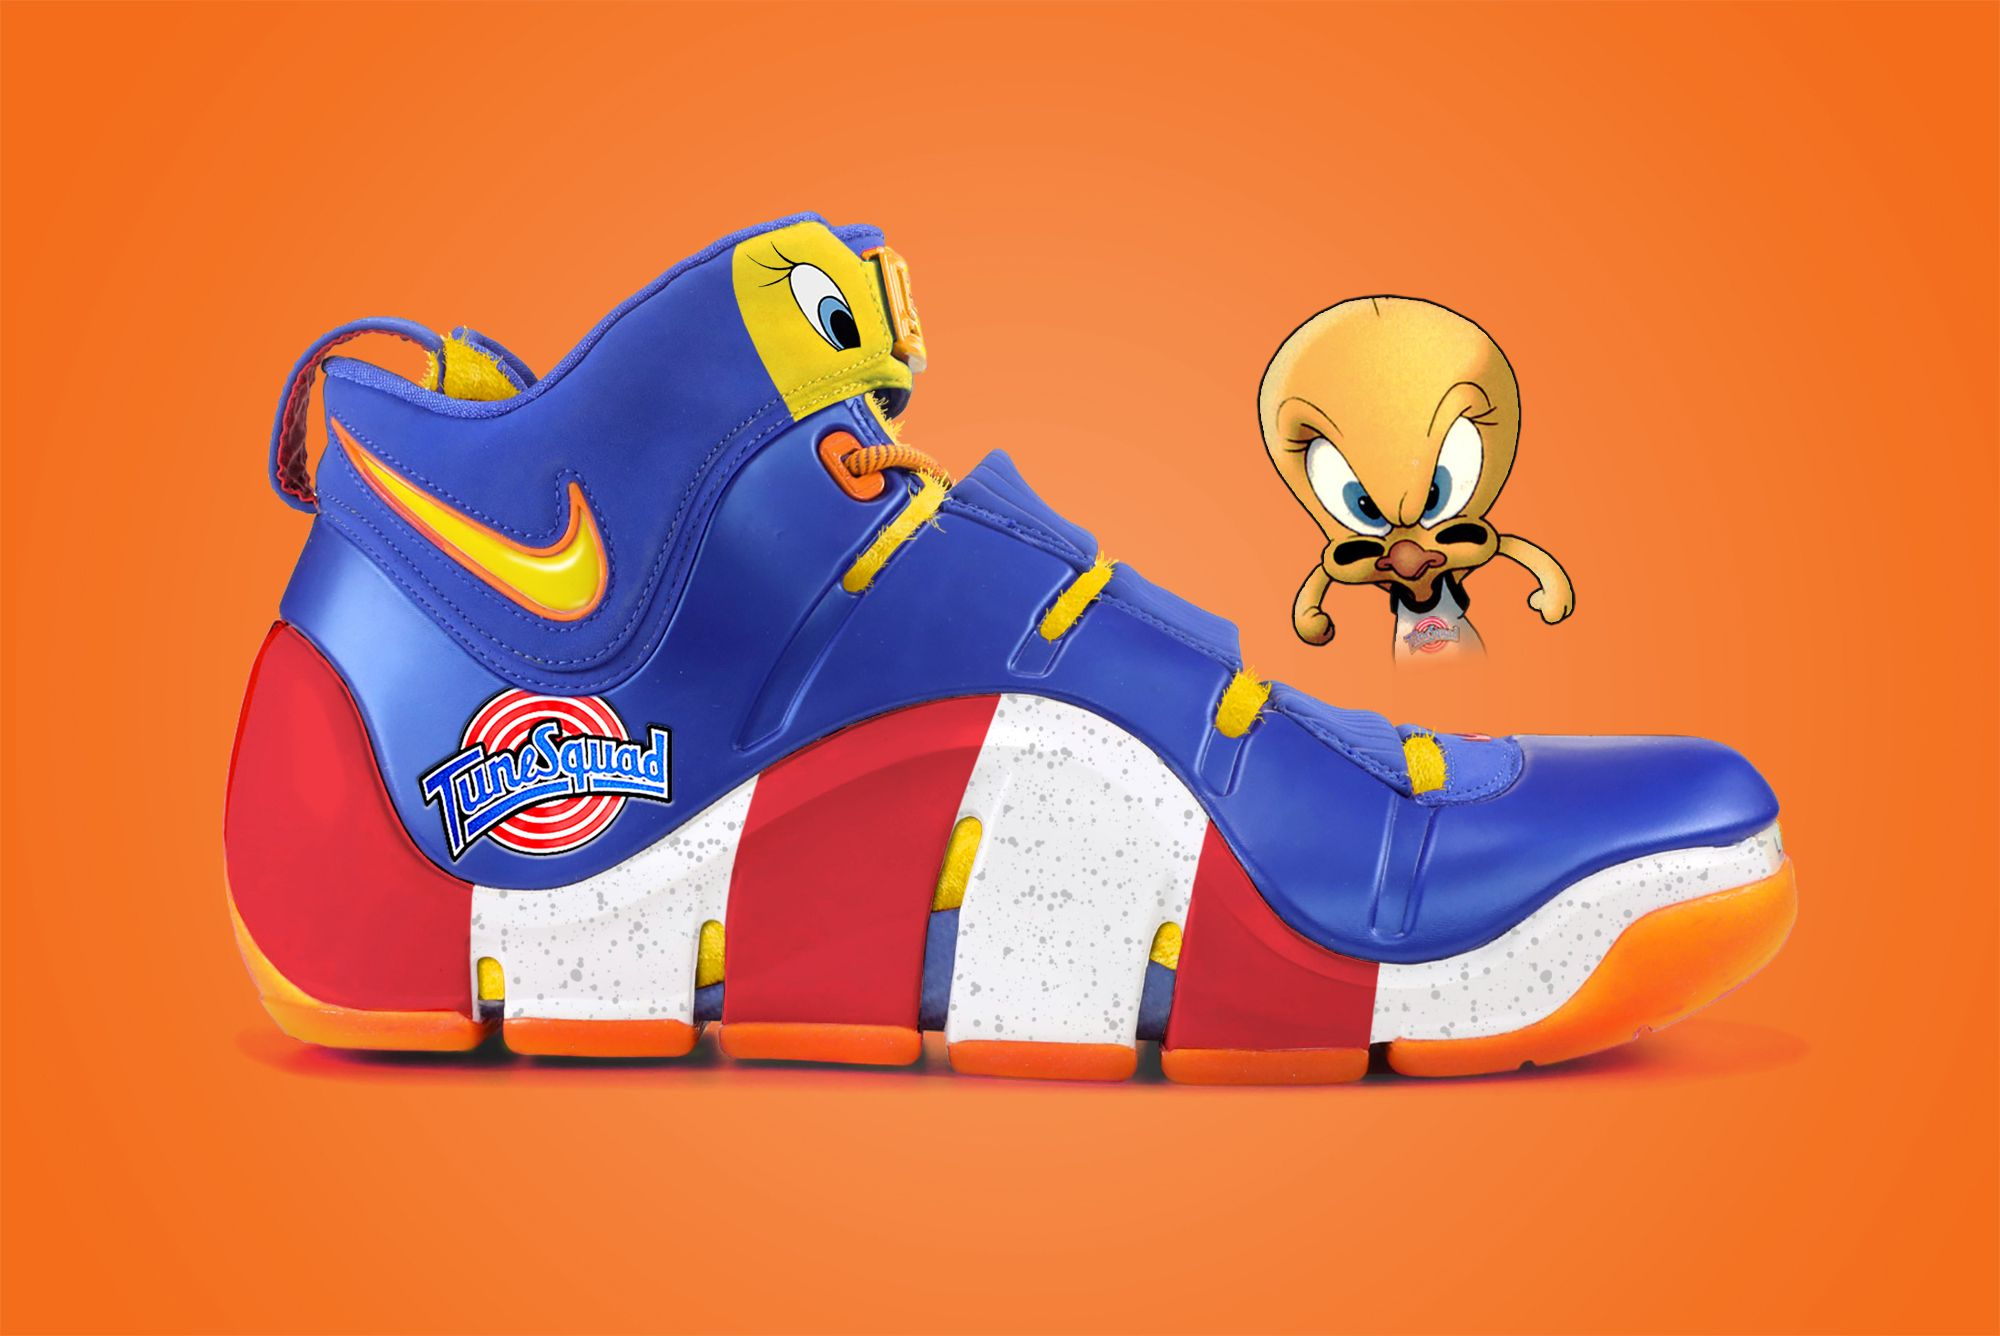 Nike LeBron 4 'Tune Squad: Tweety'